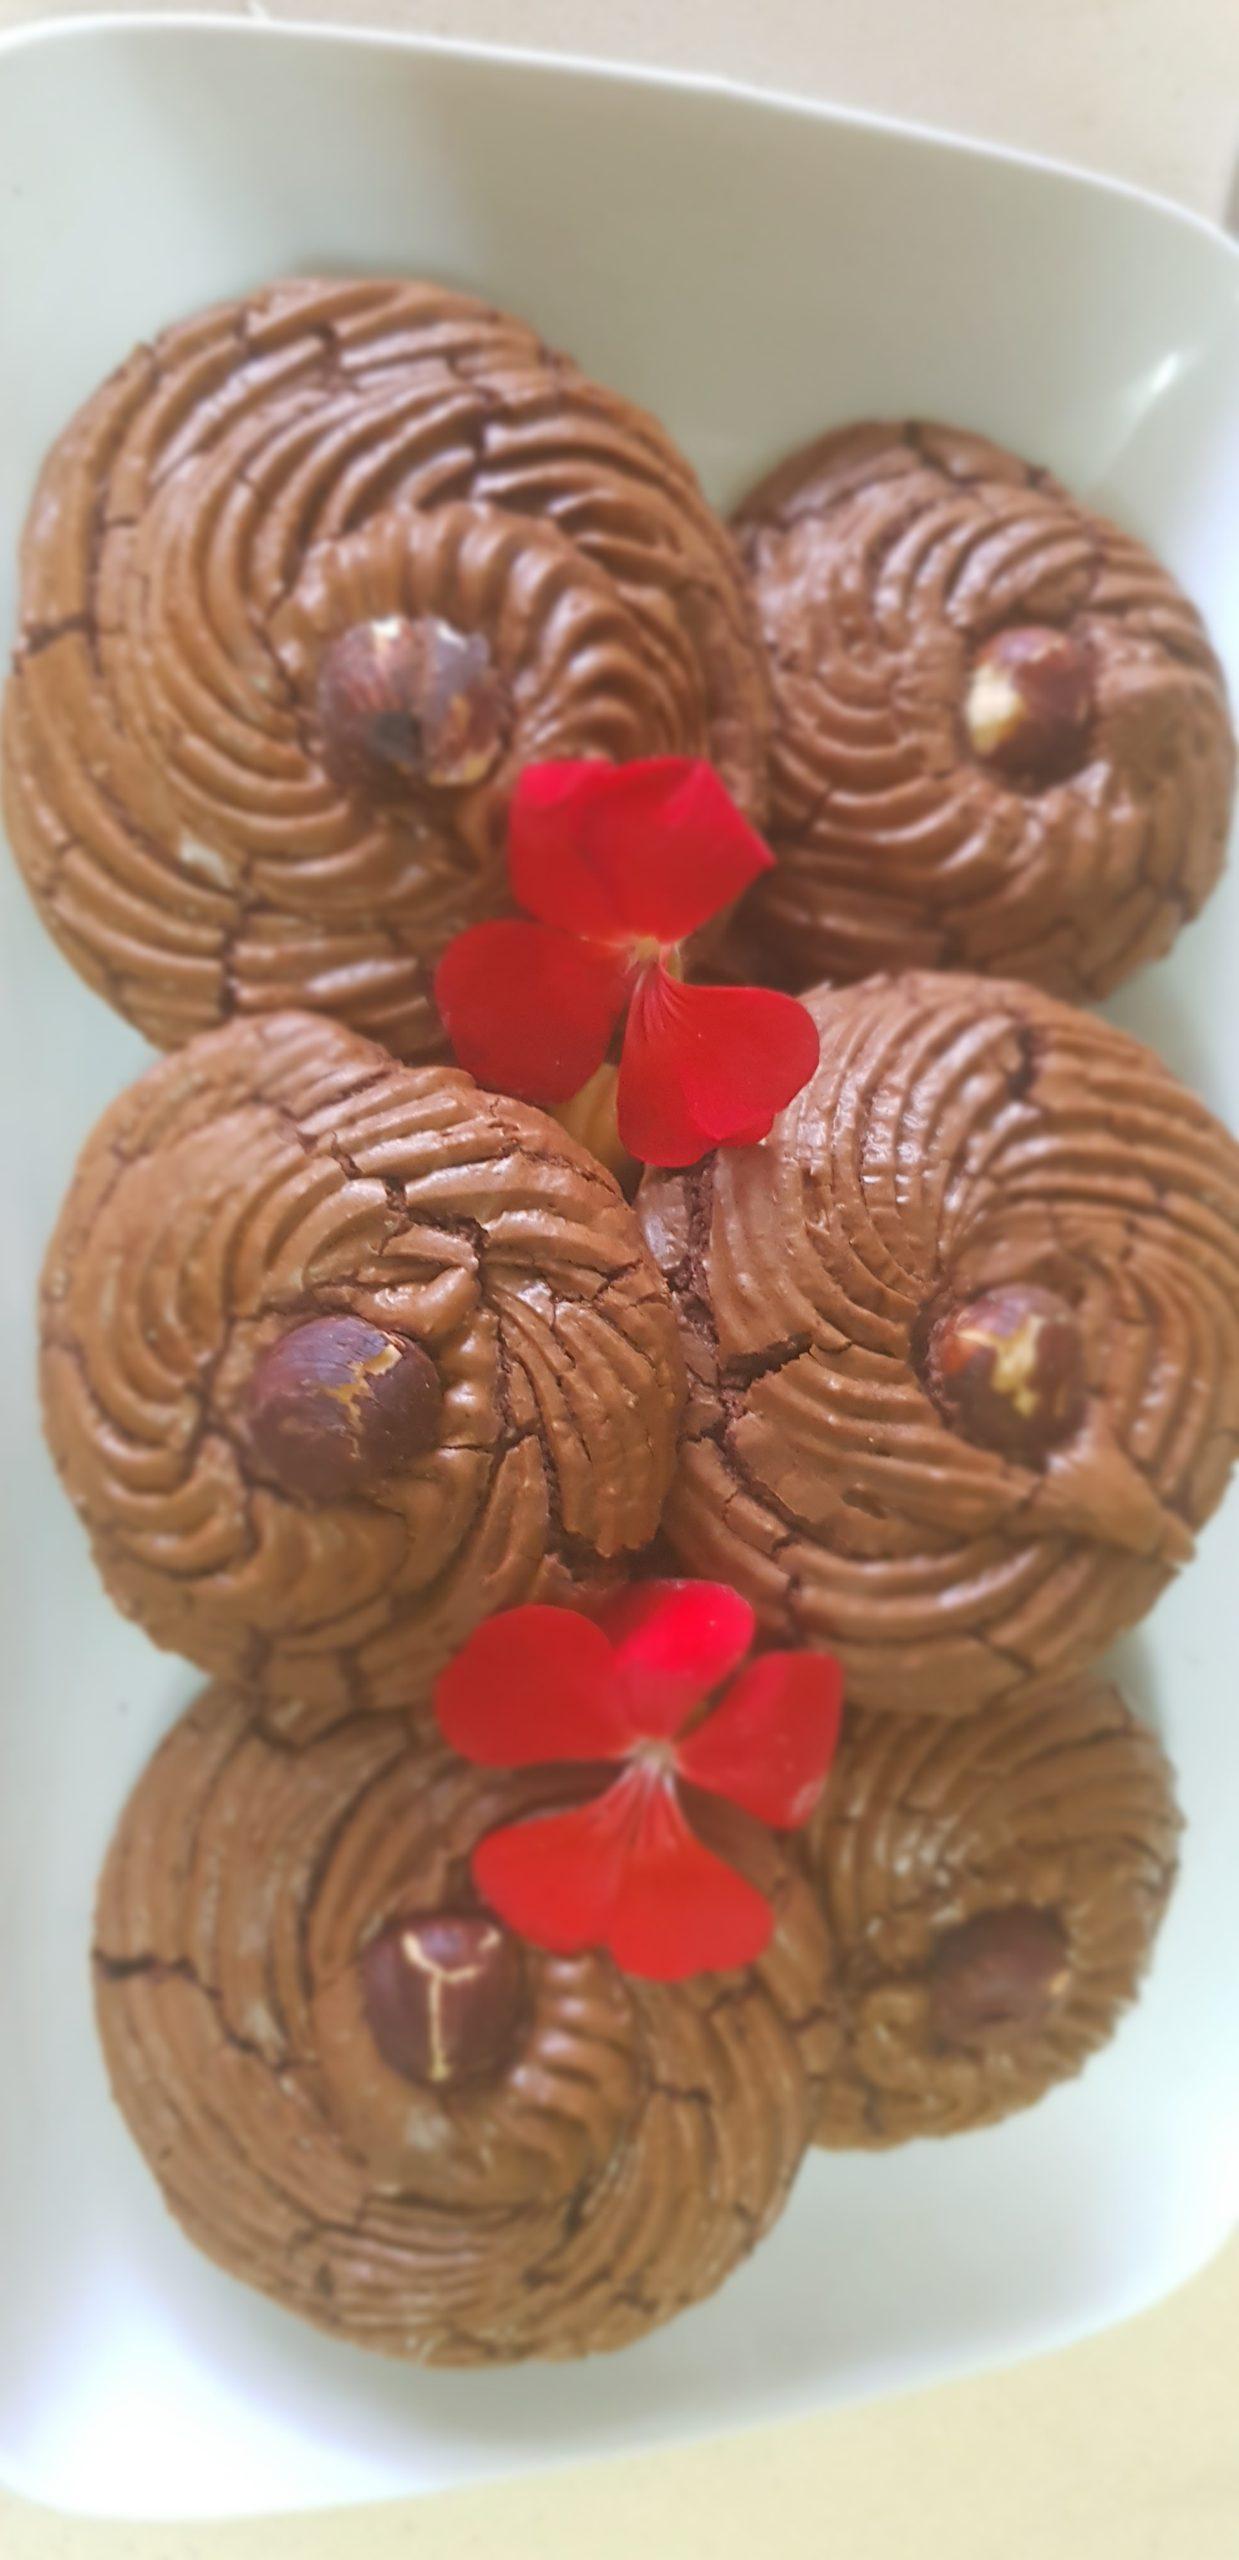 Les biscuits Fudgy Brownie au chocolat fondant